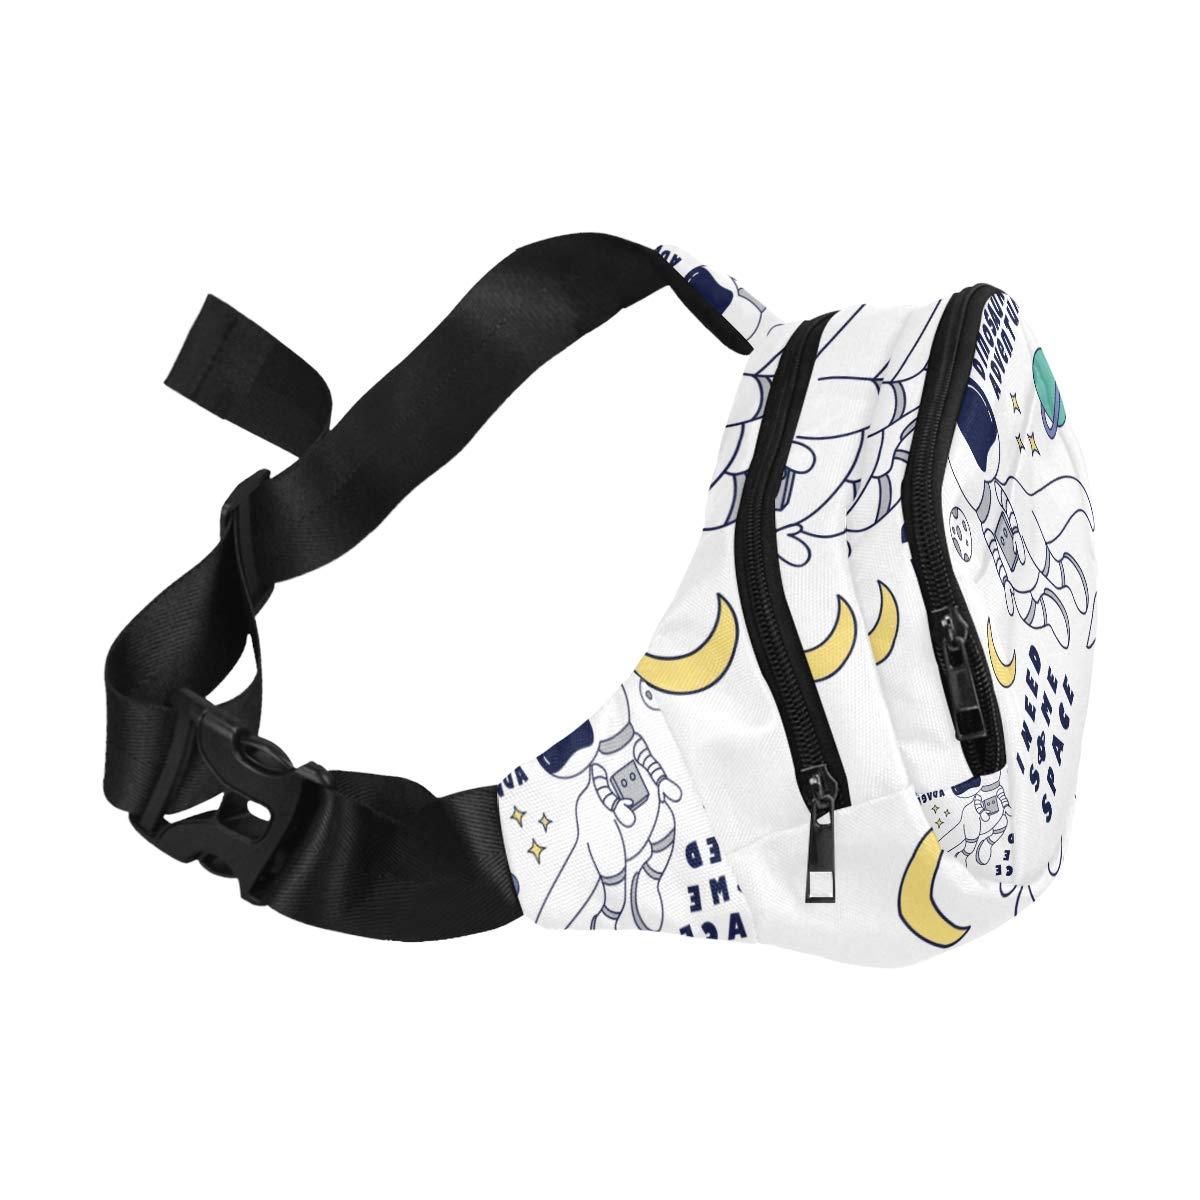 A Cute Astronaut Dinosaur Fenny Packs Waist Bags Adjustable Belt Waterproof Nylon Travel Running Sport Vacation Party For Men Women Boys Girls Kids